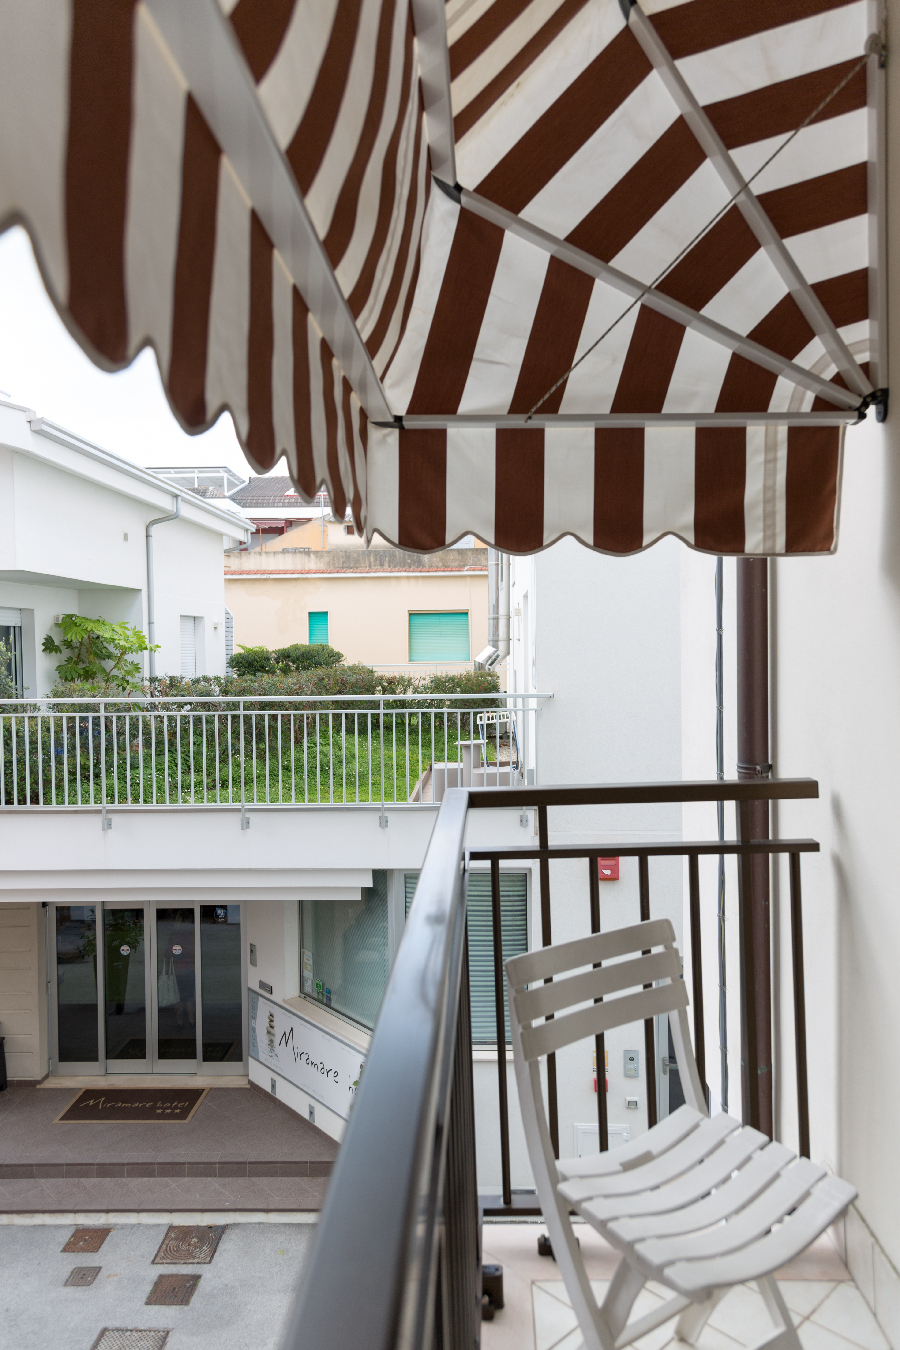 Miramare Hotel Dipendenza Tripla Comfort 30